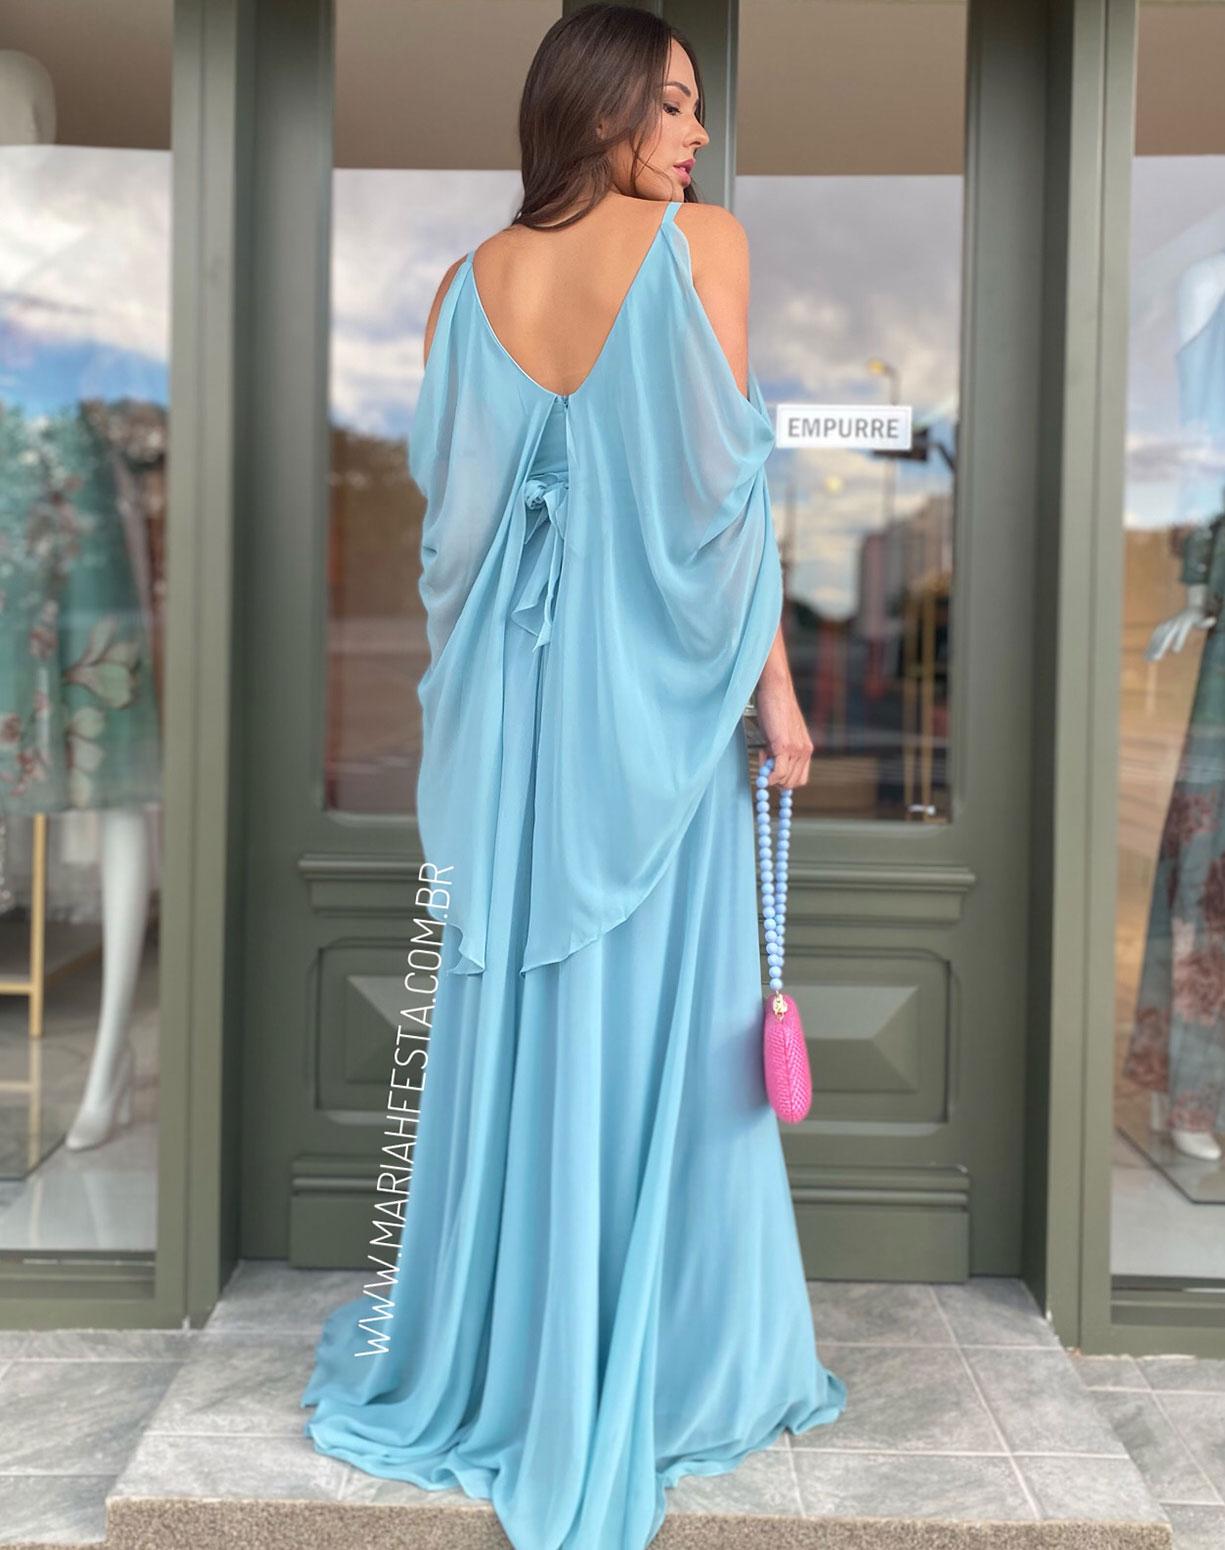 Vestido Azul Serenity Manga Capa e Saia Evasê